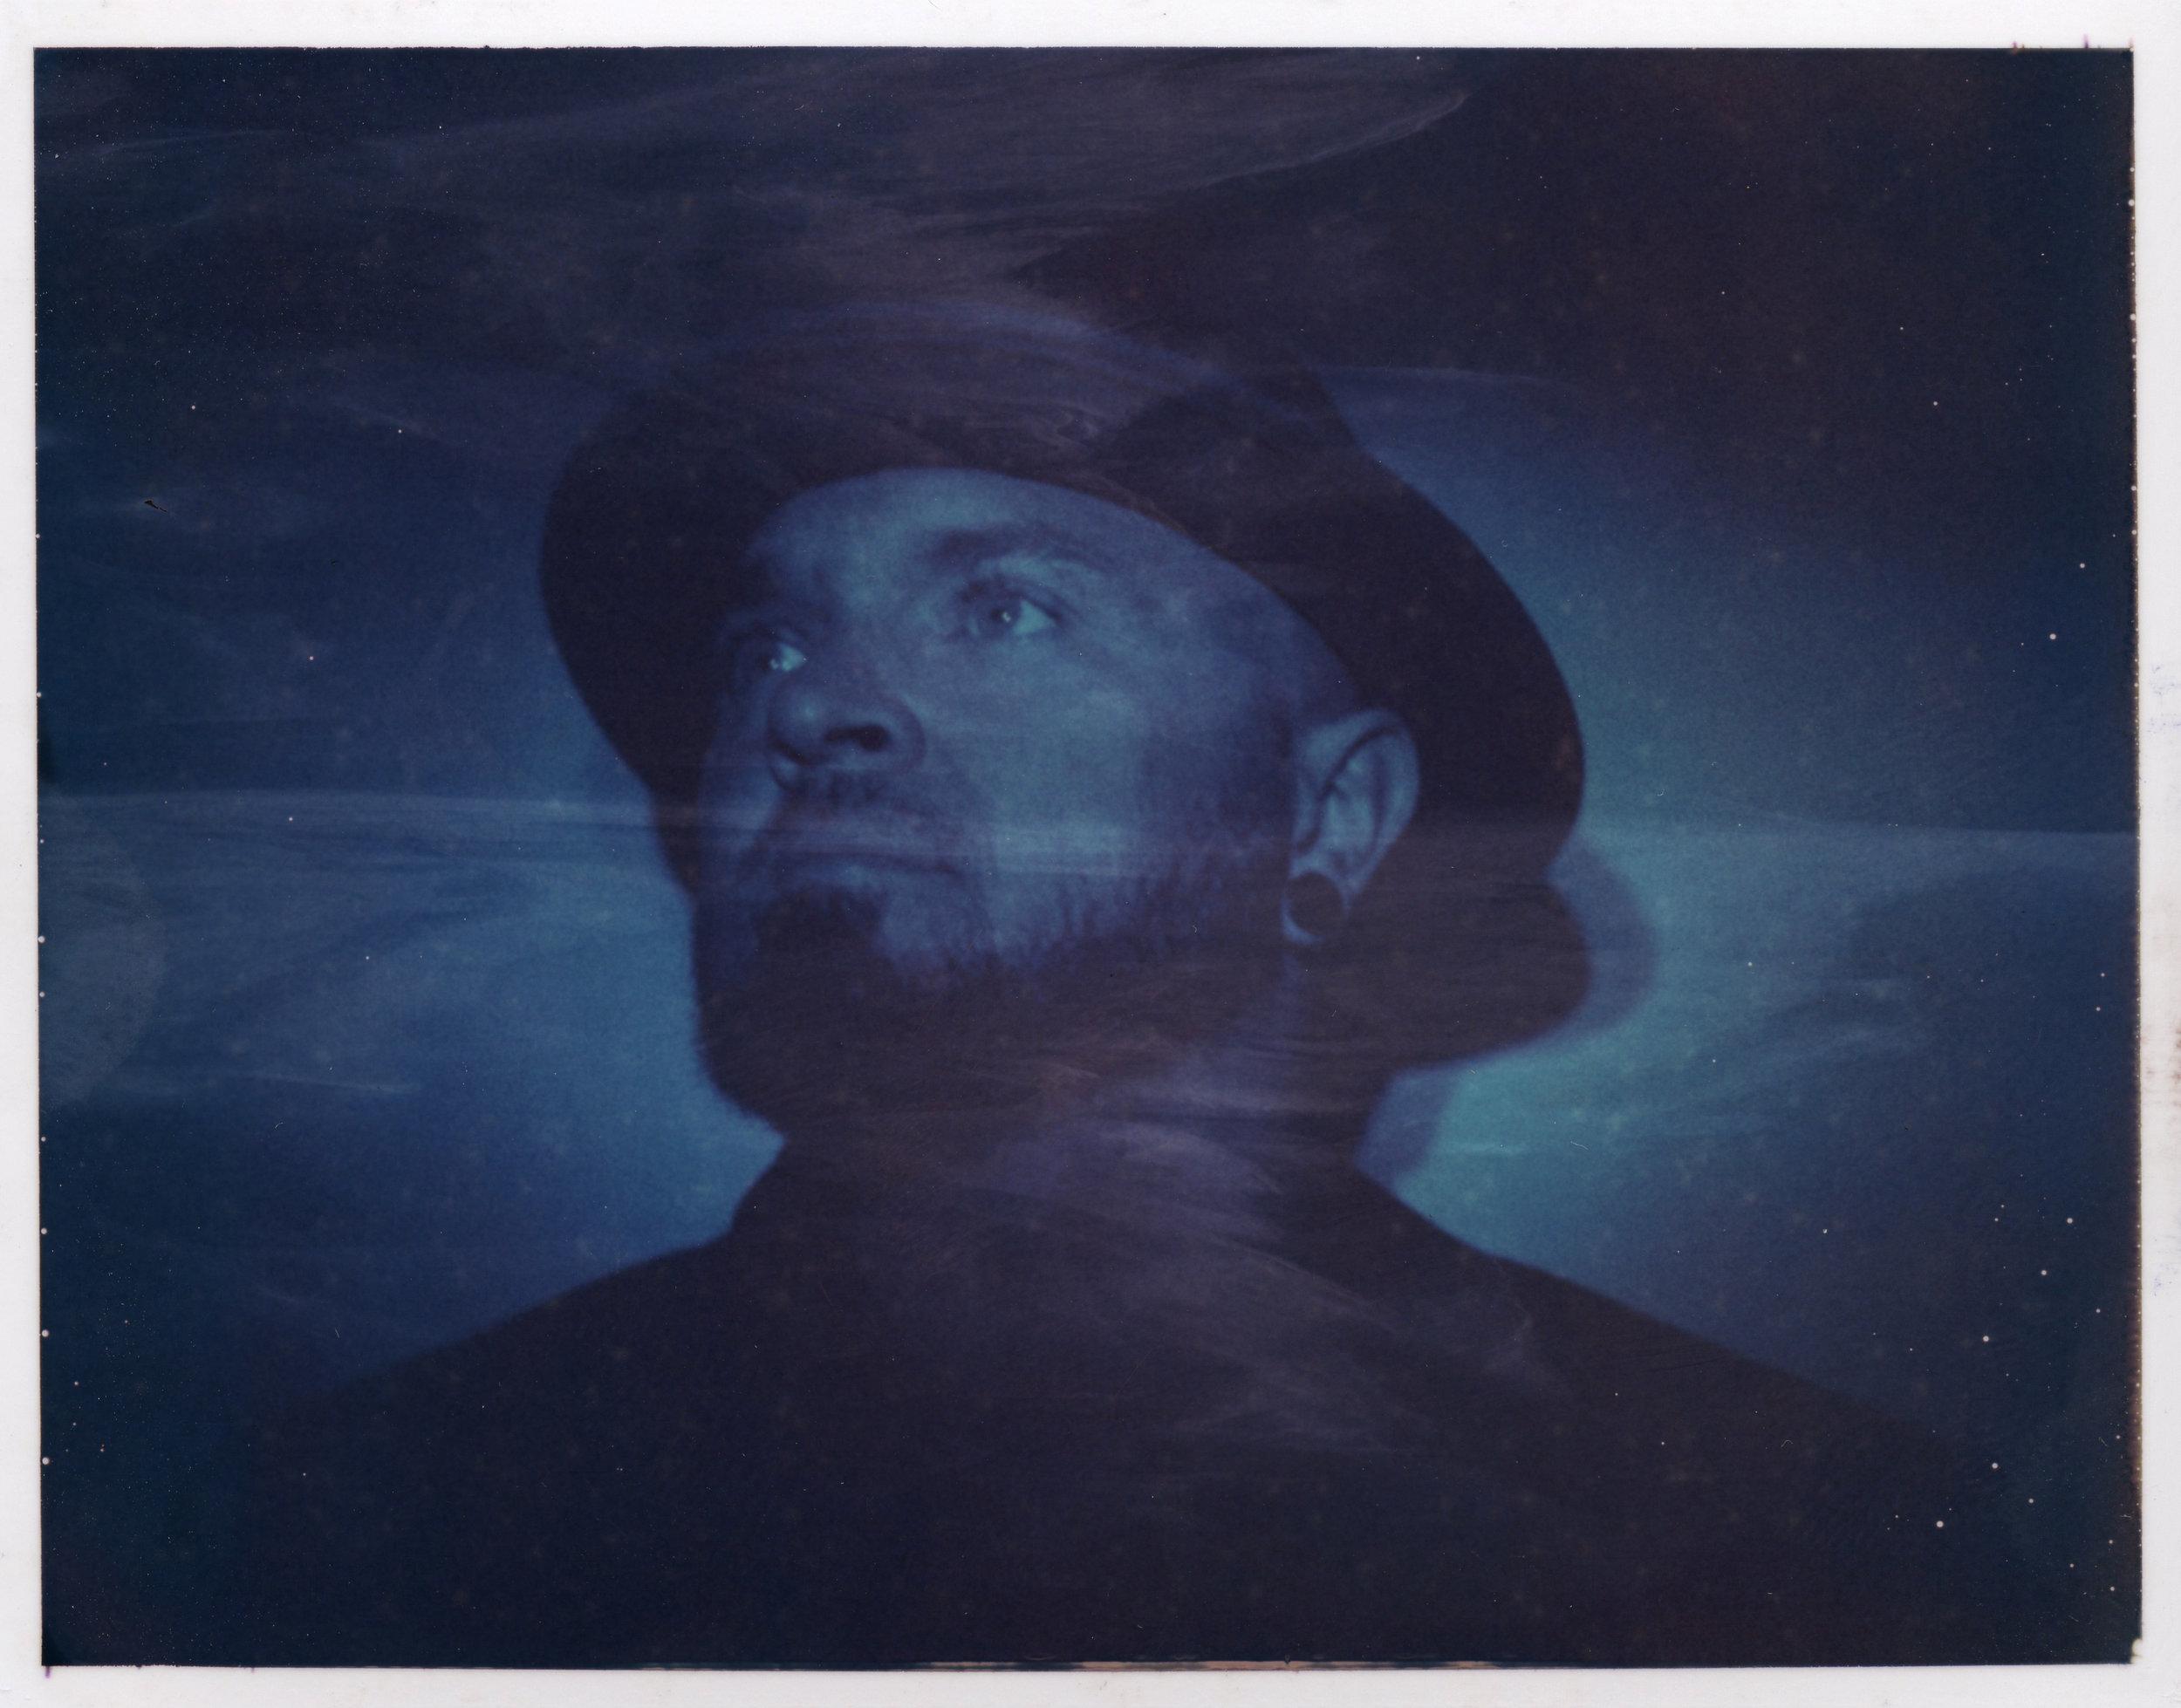 Aaron_Strumpel_Hymns_polaroid_04.jpg